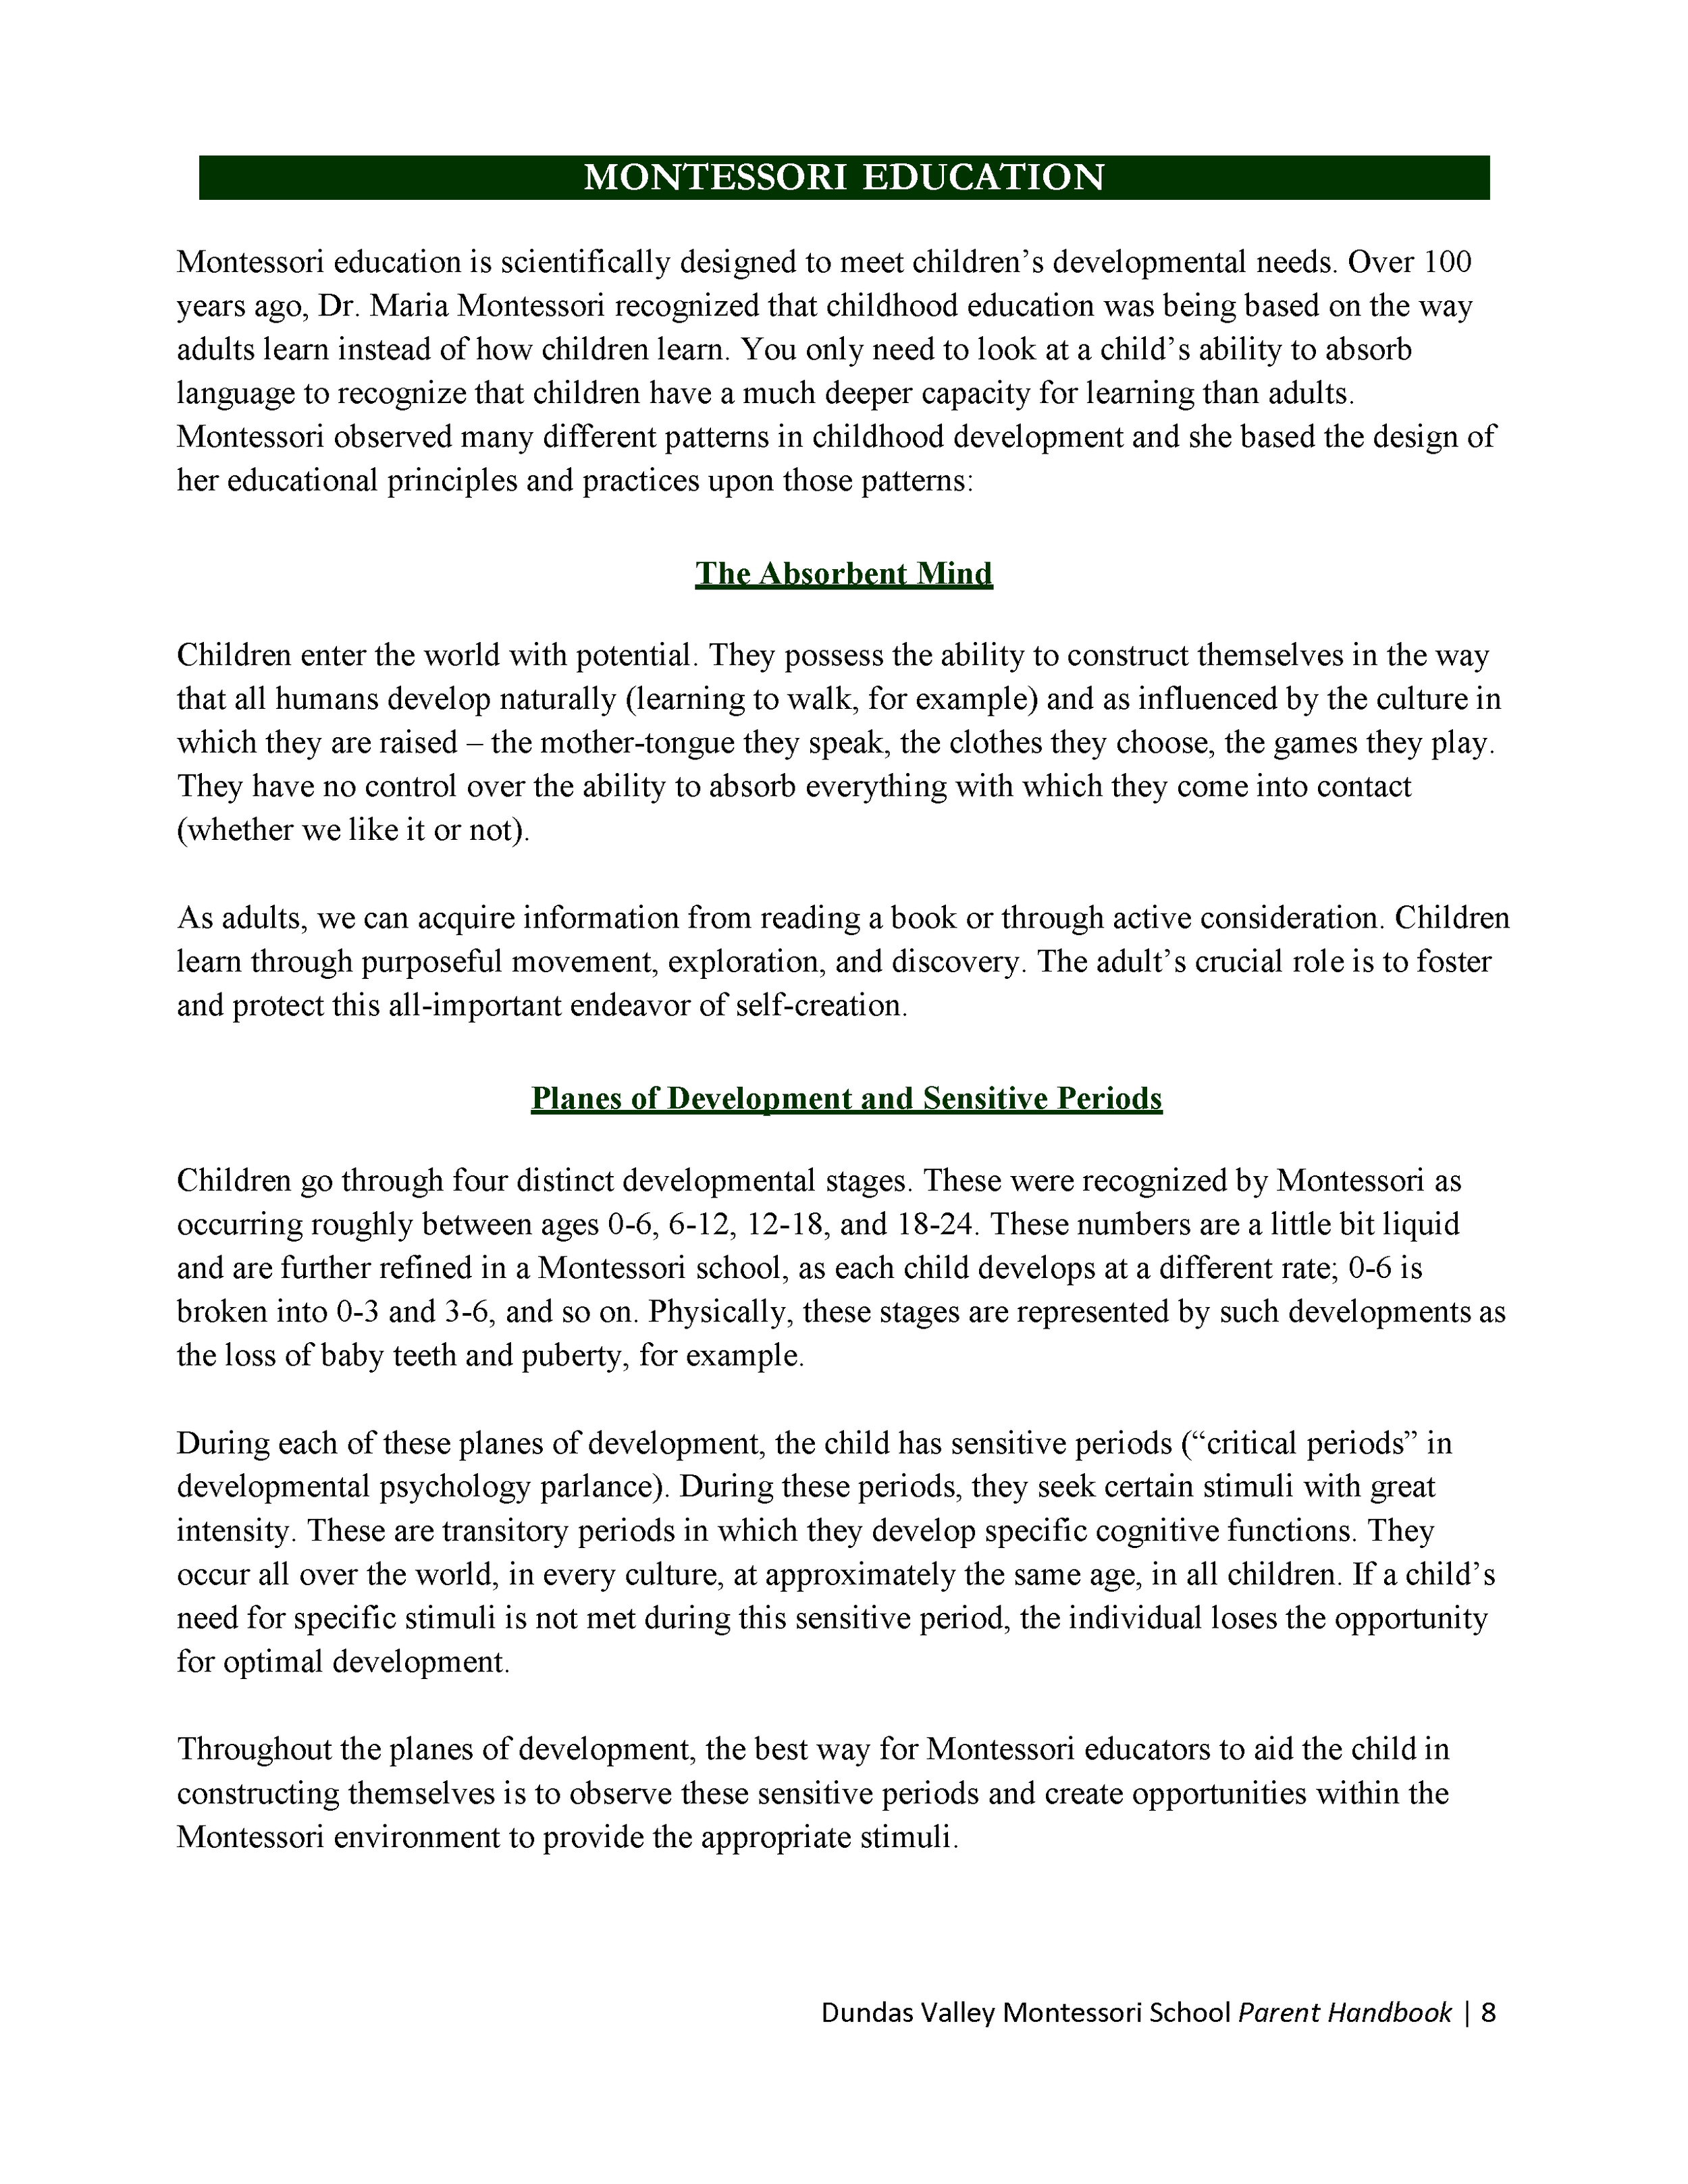 DVMS-Parent-Handbook-19-20_Page_010.png